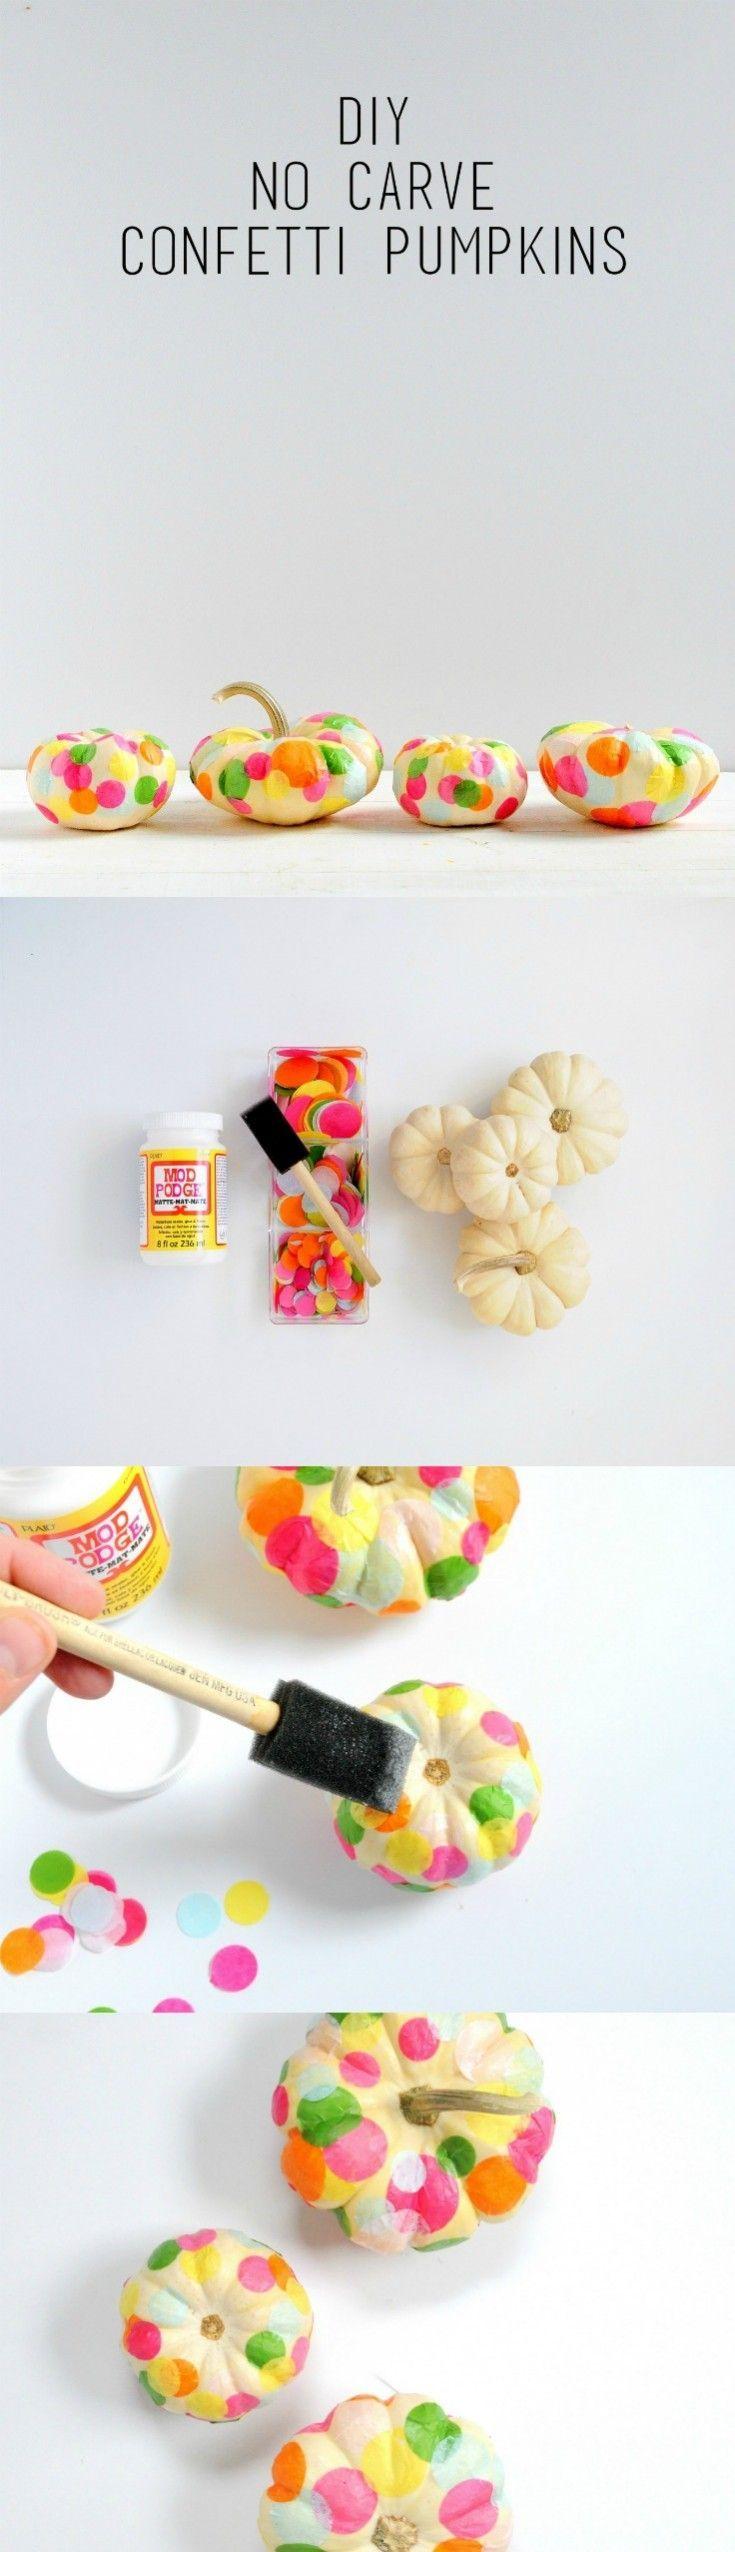 best makinu sht images on pinterest creative crafts birthday